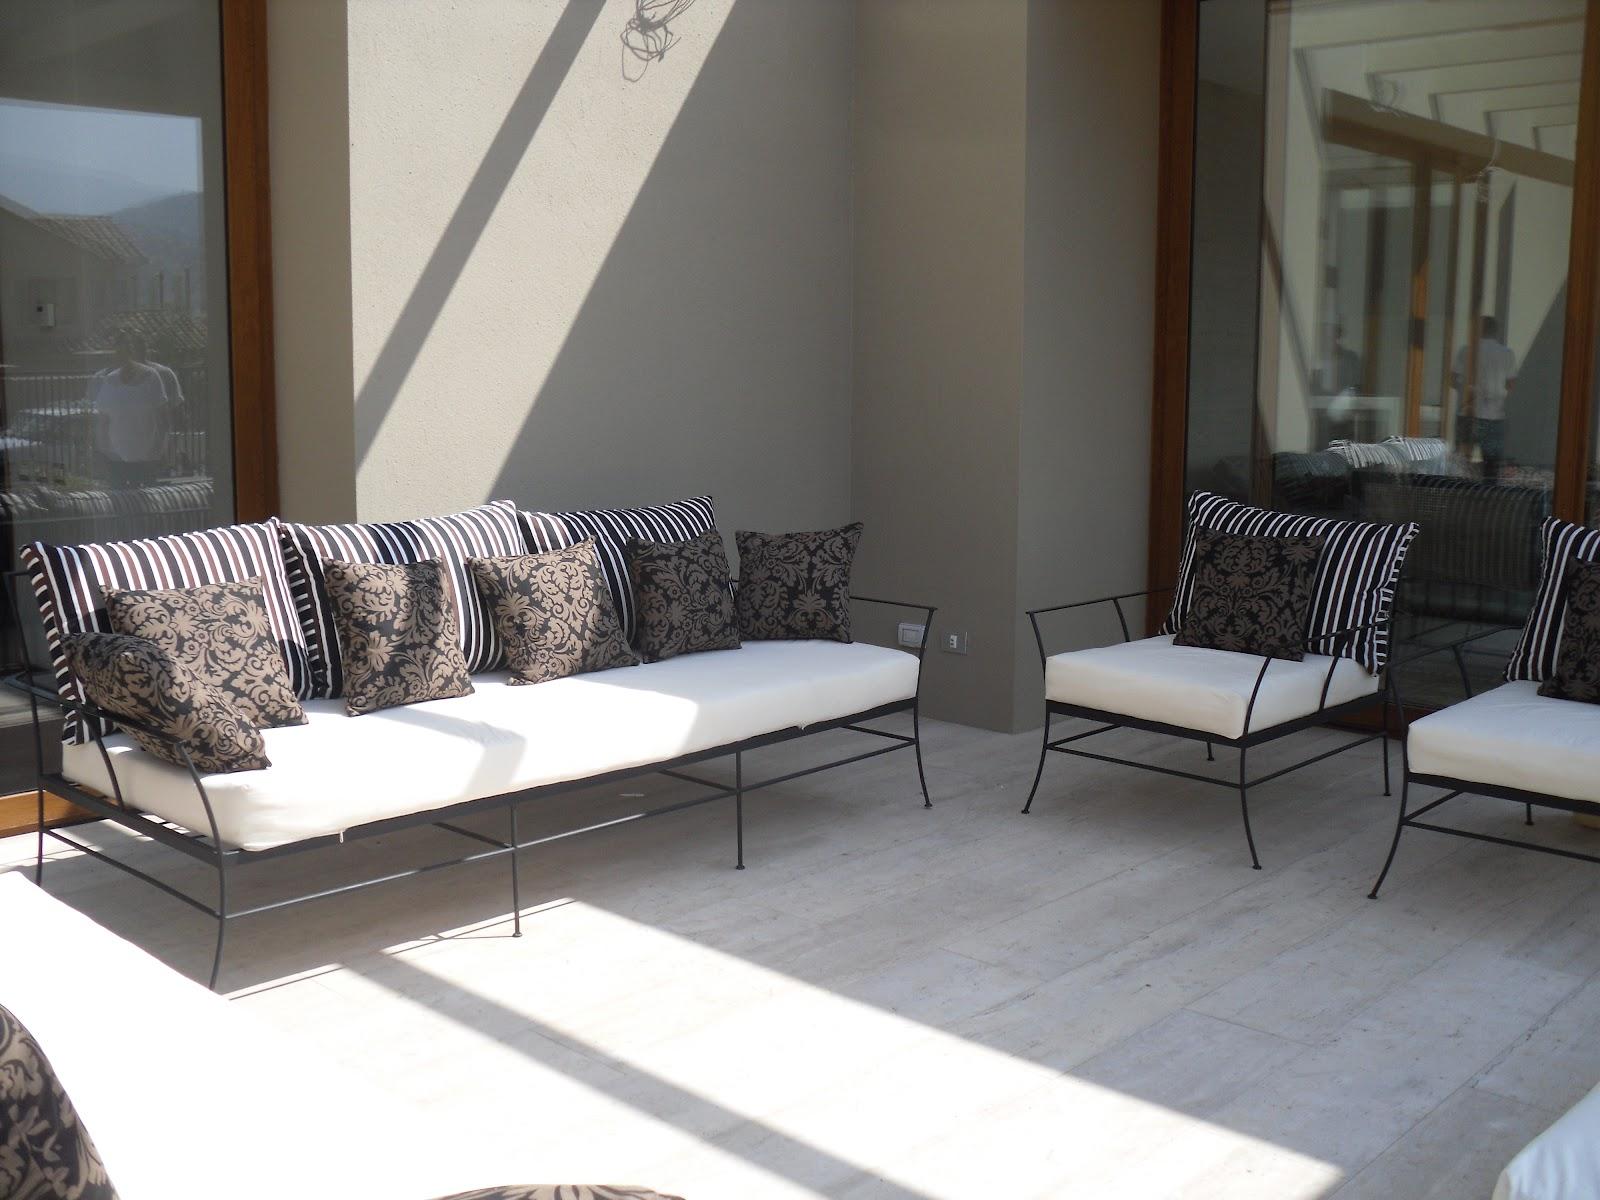 Muebles zulema muebles de terraza for Muebles de terraza fierro